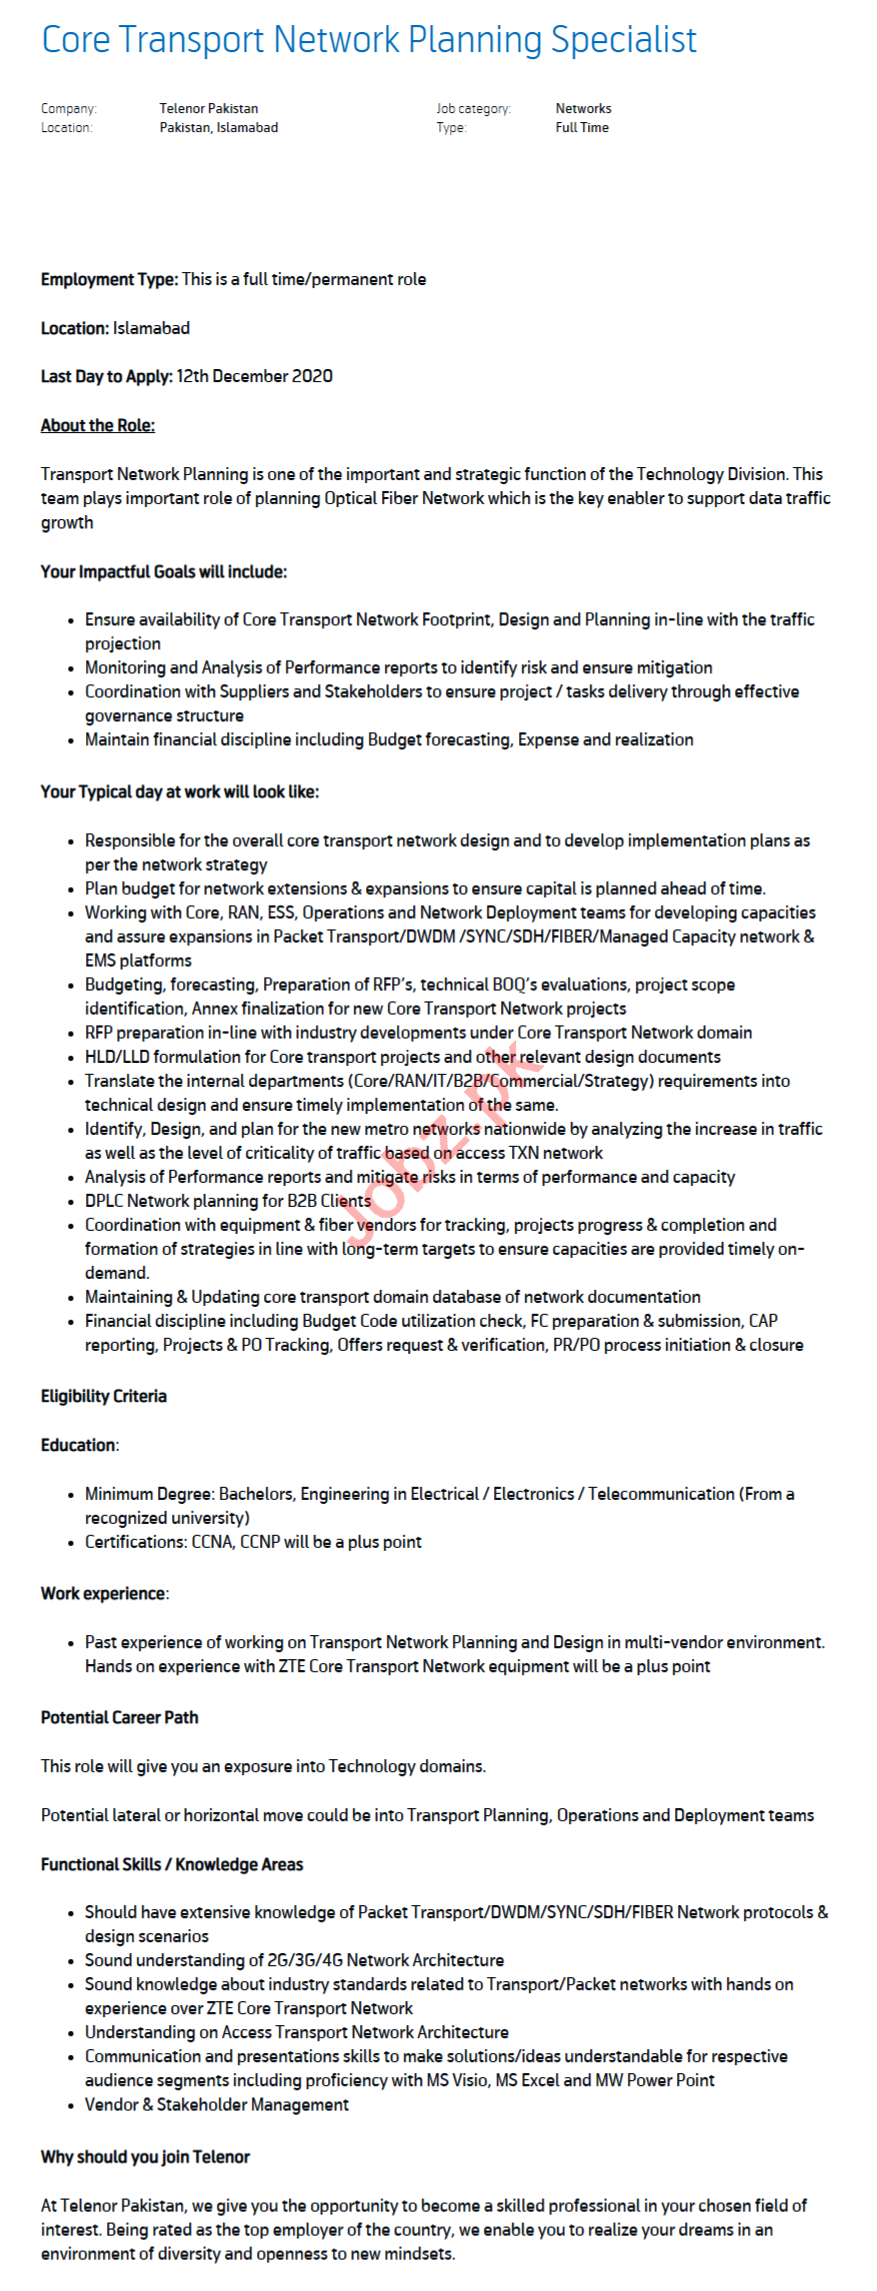 Core Transport Network Planning Specialist Jobs 2021